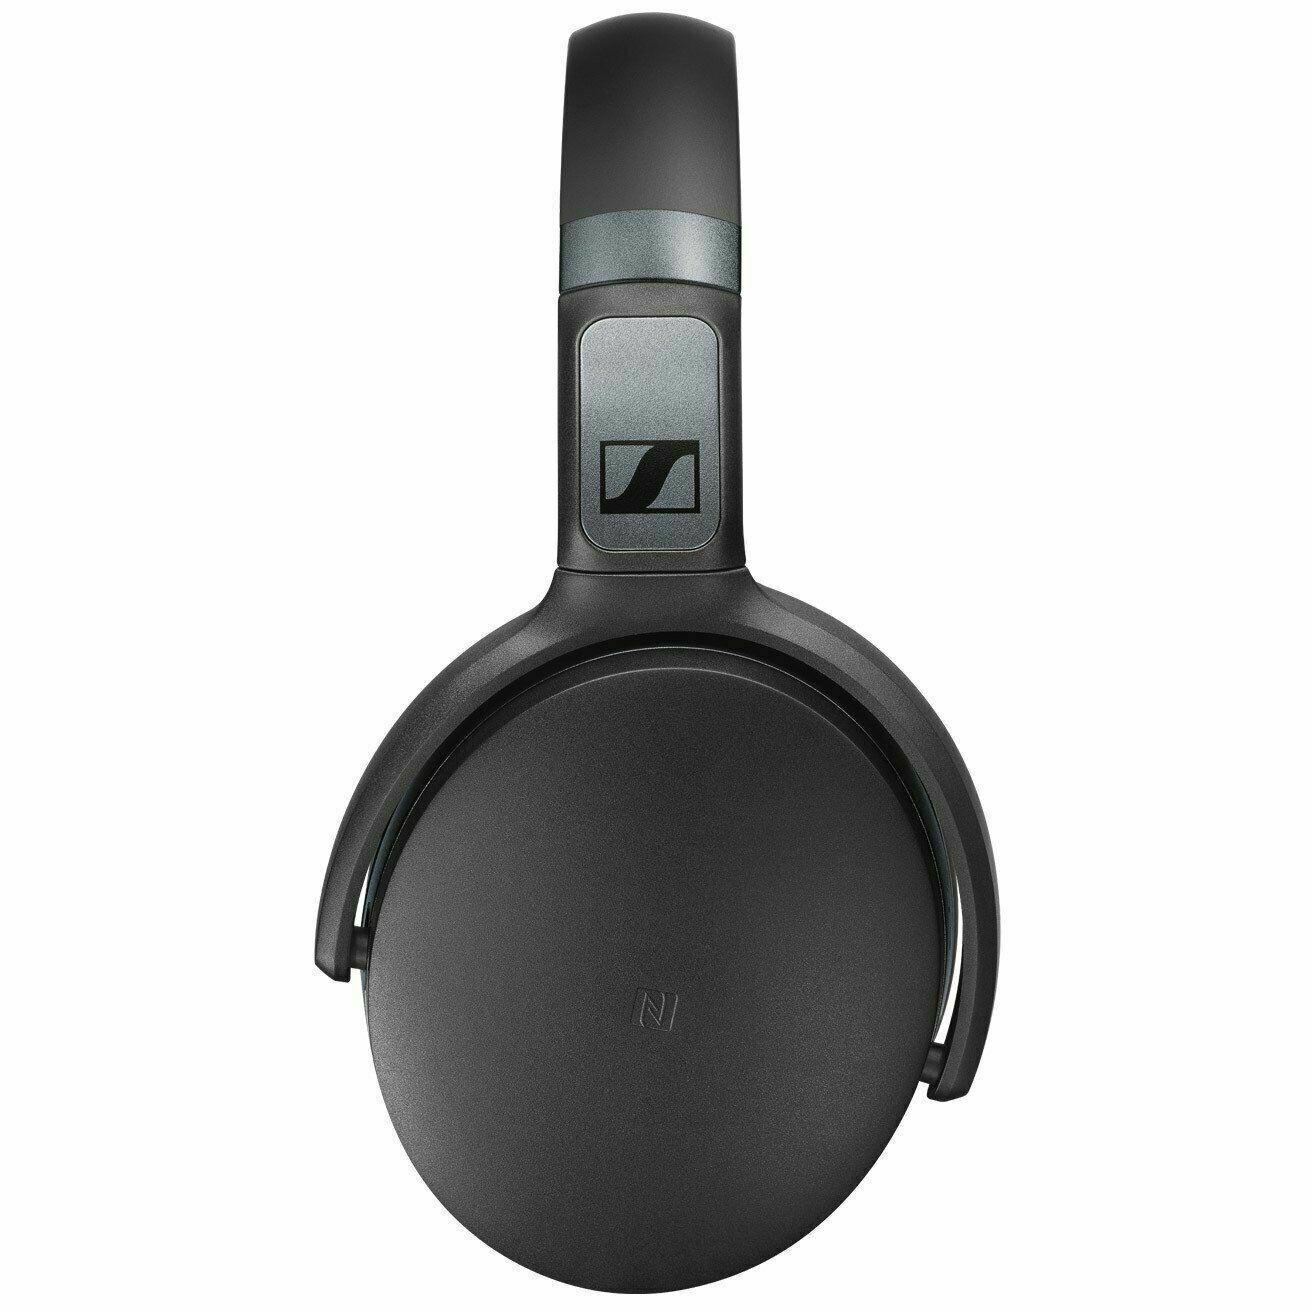 Sennheiser HD 4.40BT Wireless bluetooth Headphones Hi-Fi Headset Deep Bass Noise Isolation Stereo Earphone Gaming Headset black enlarge